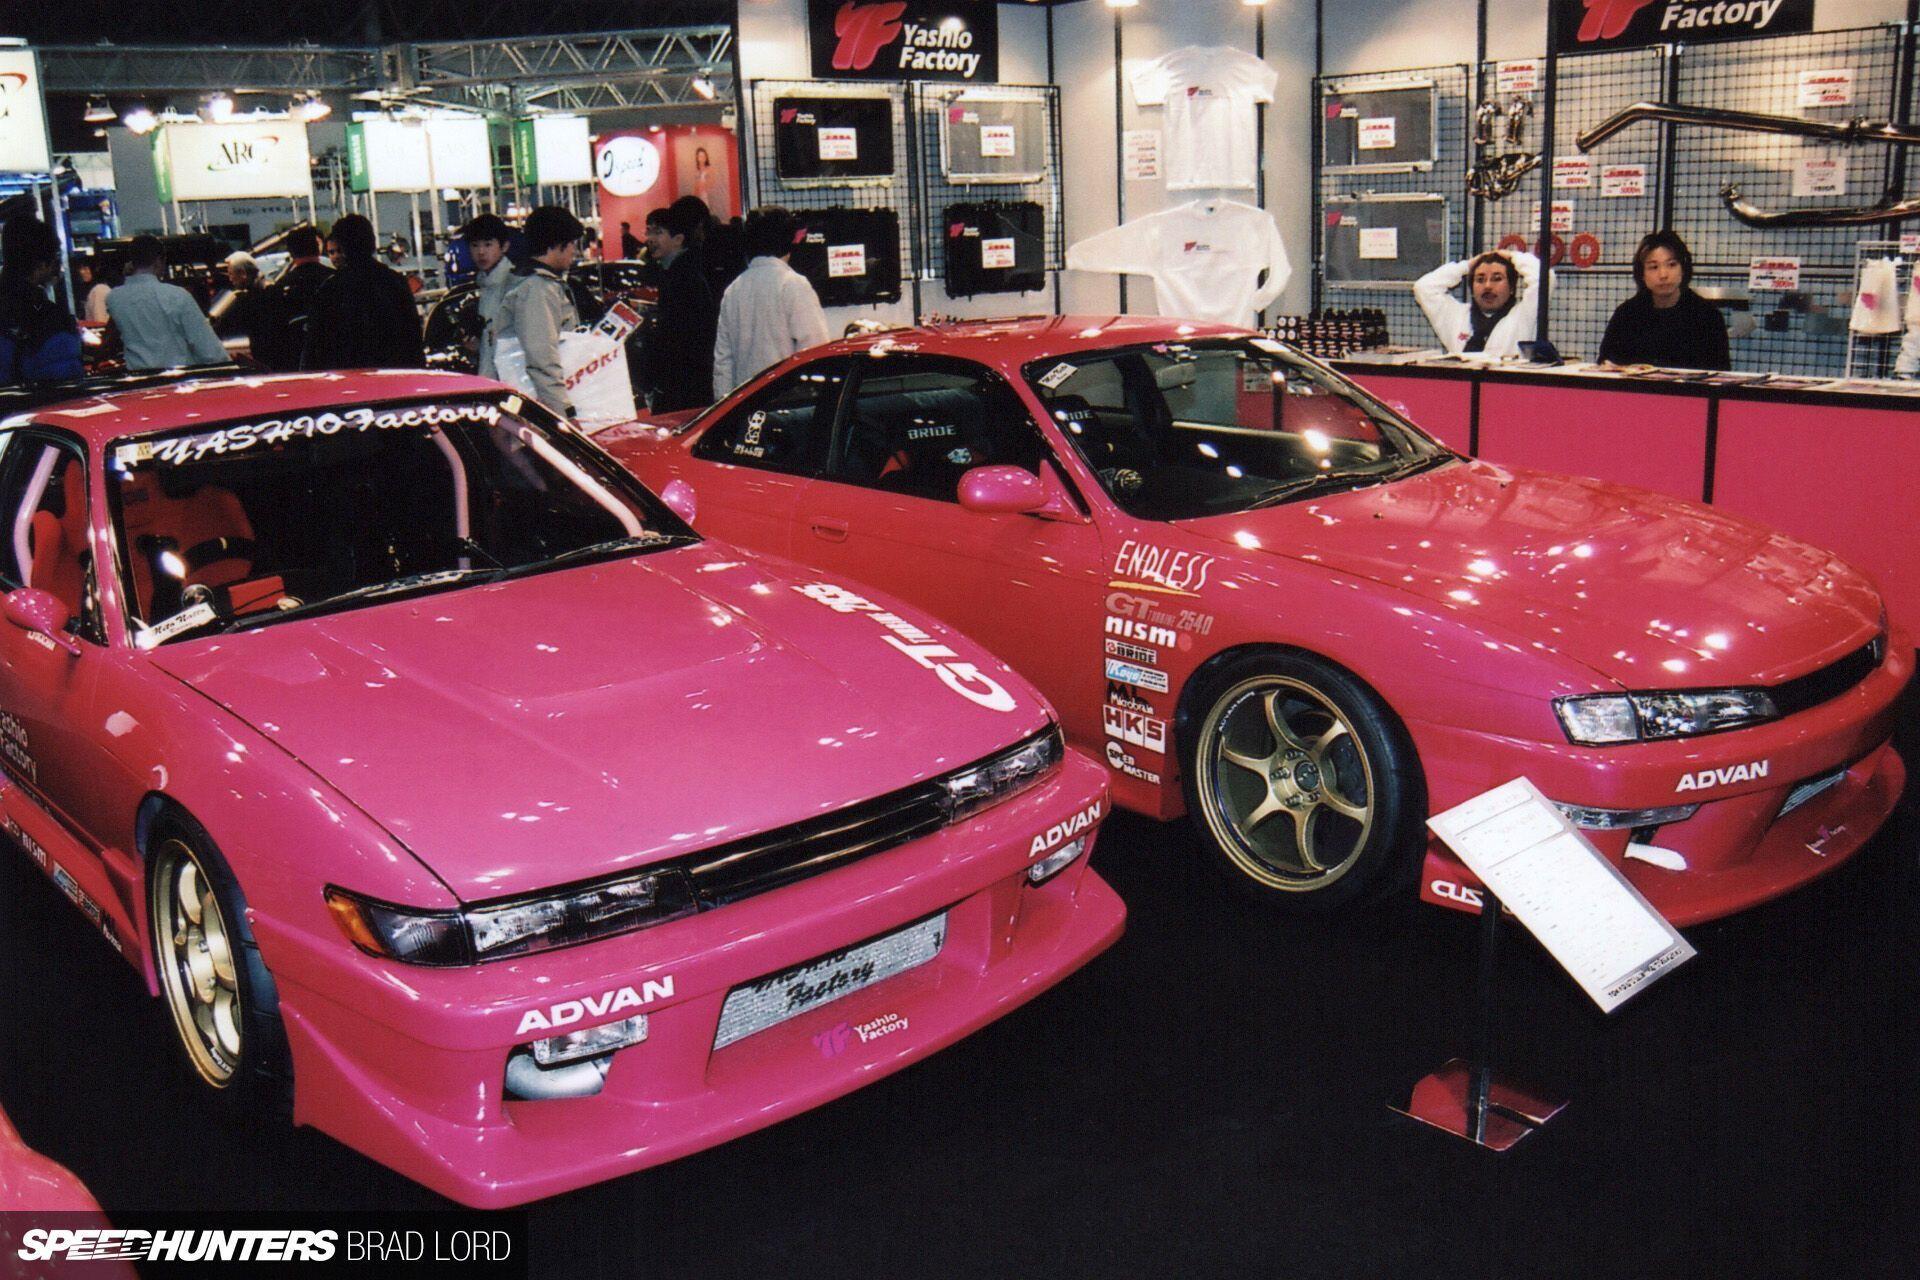 S13 от Yashio Factory